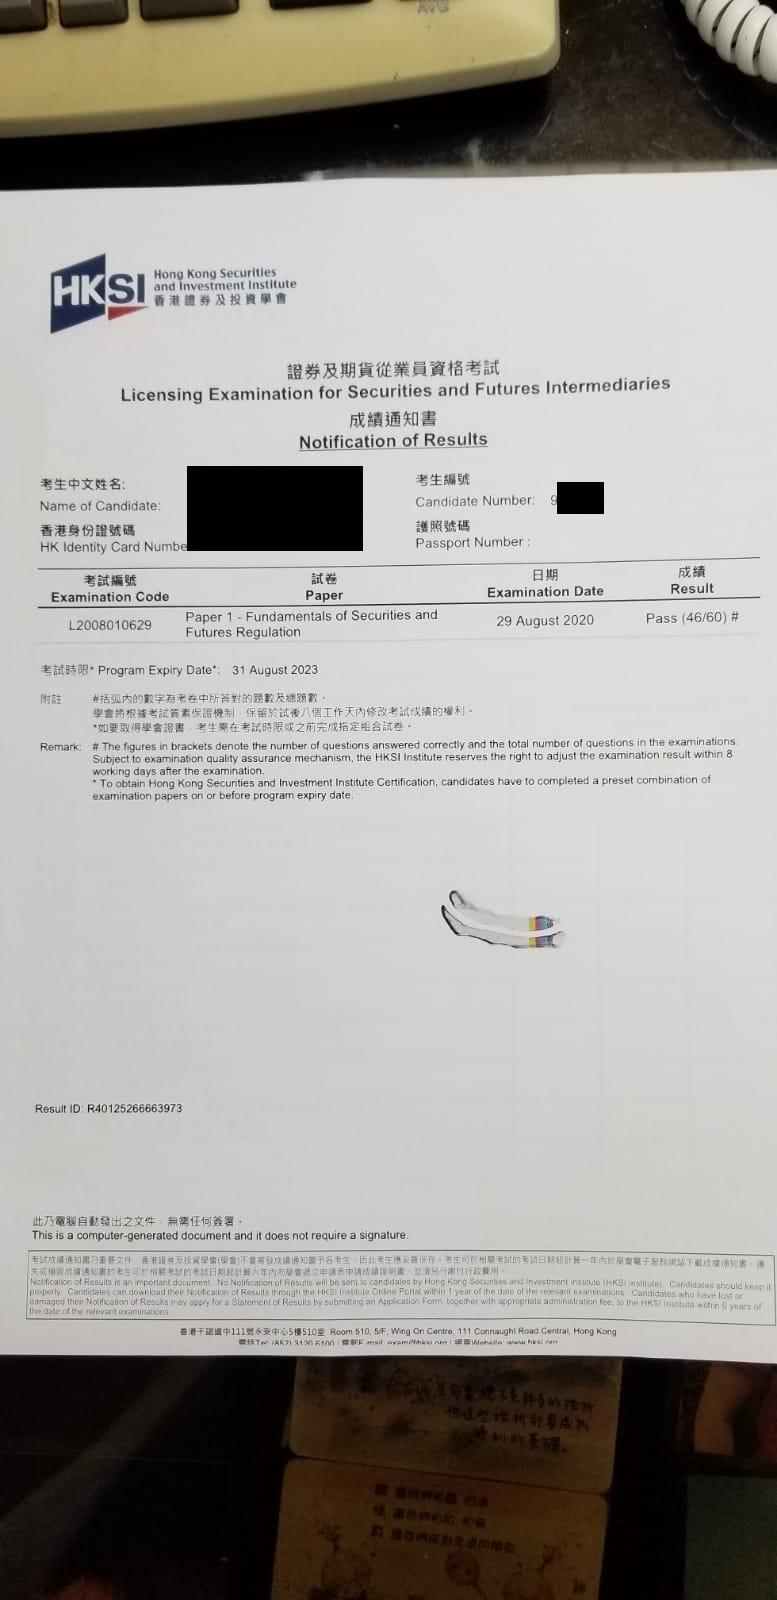 WFK 29/08/2020 LE Paper 1 證券期貨從業員資格考試卷一 Pass